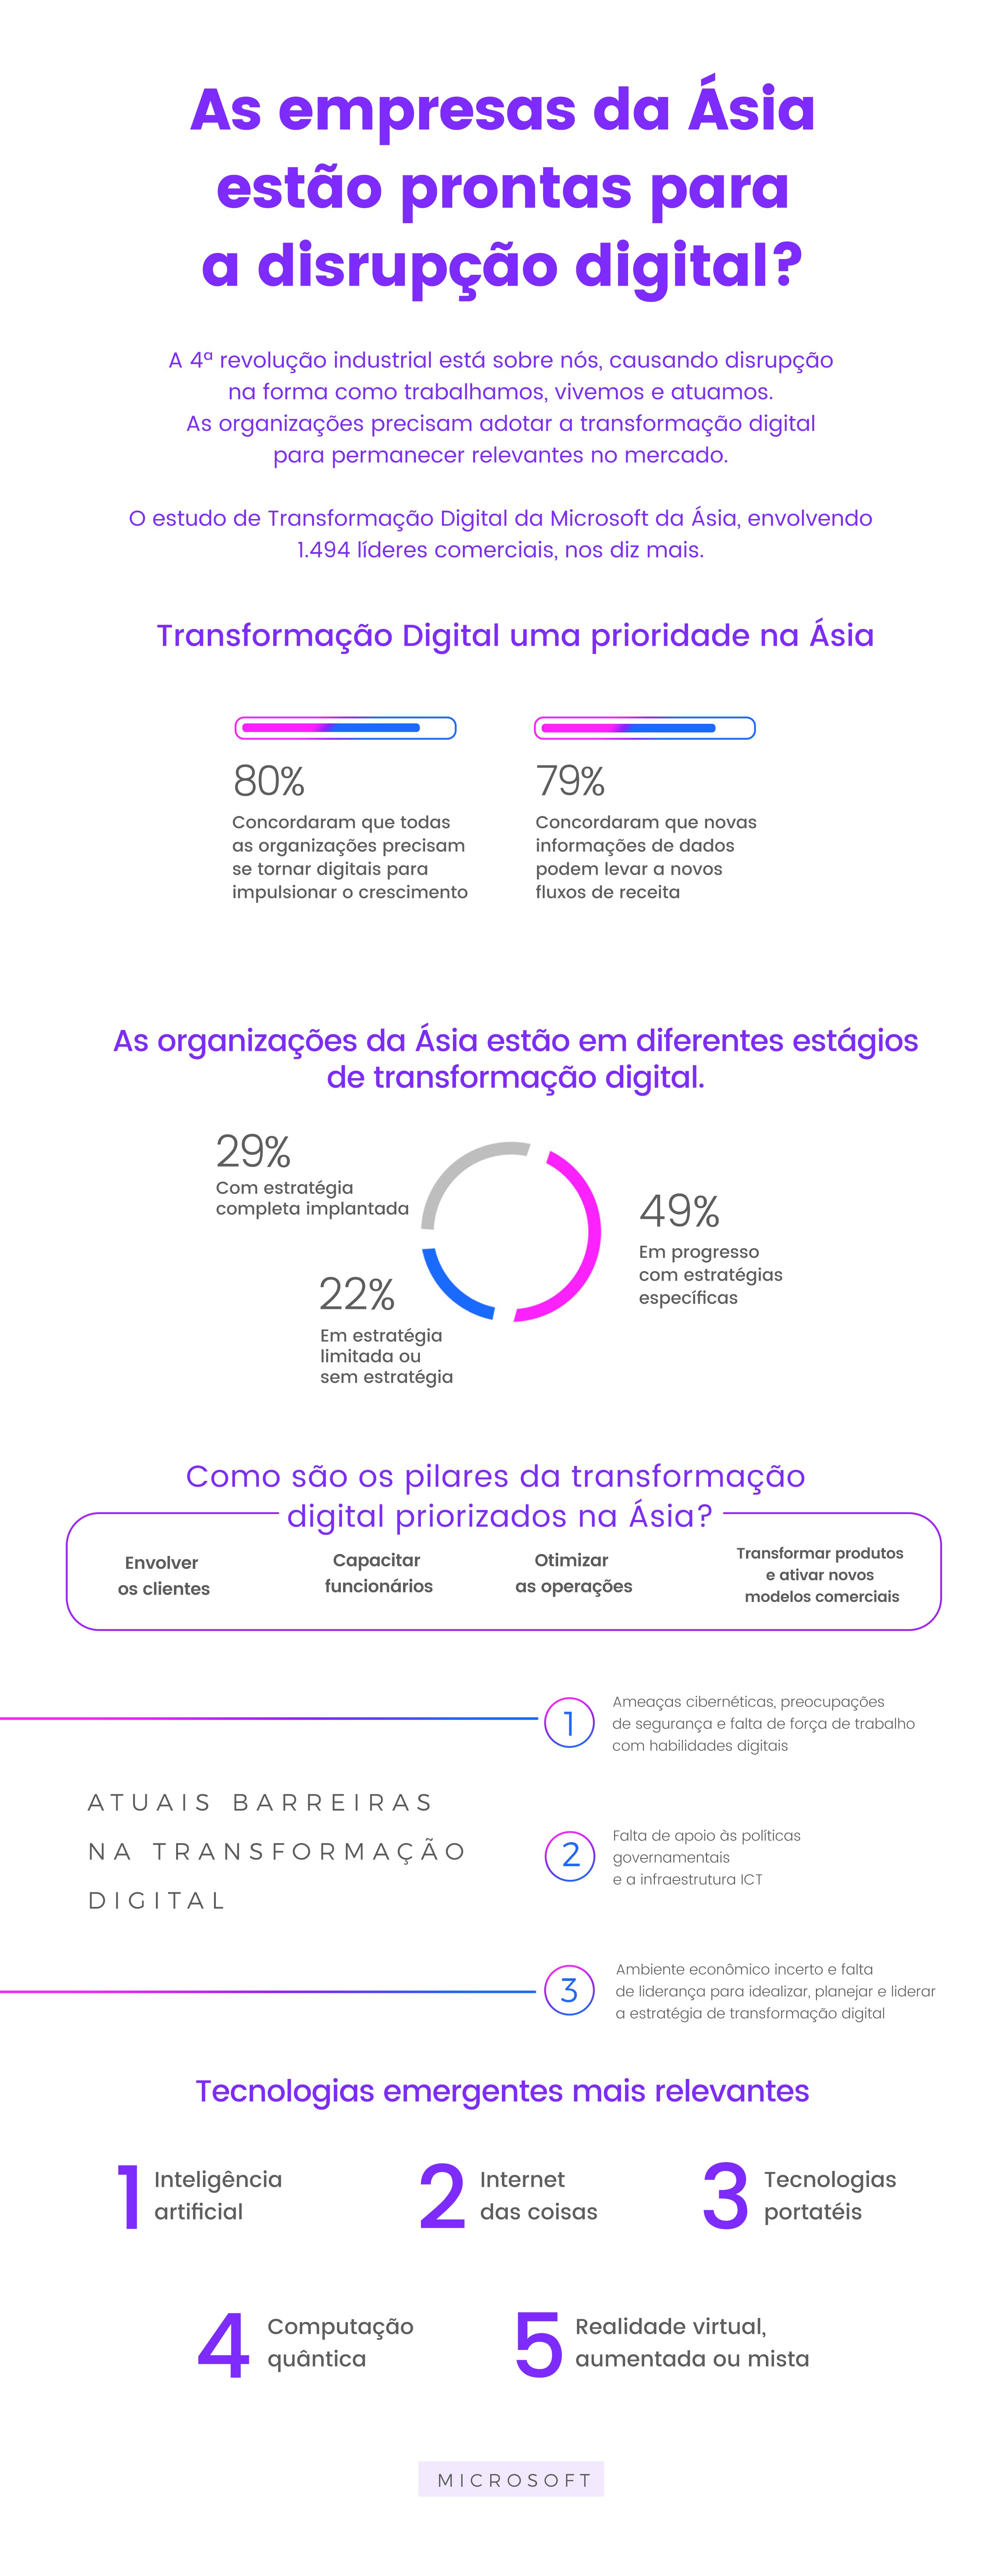 Infográfico - Transformação Digital na Ásia